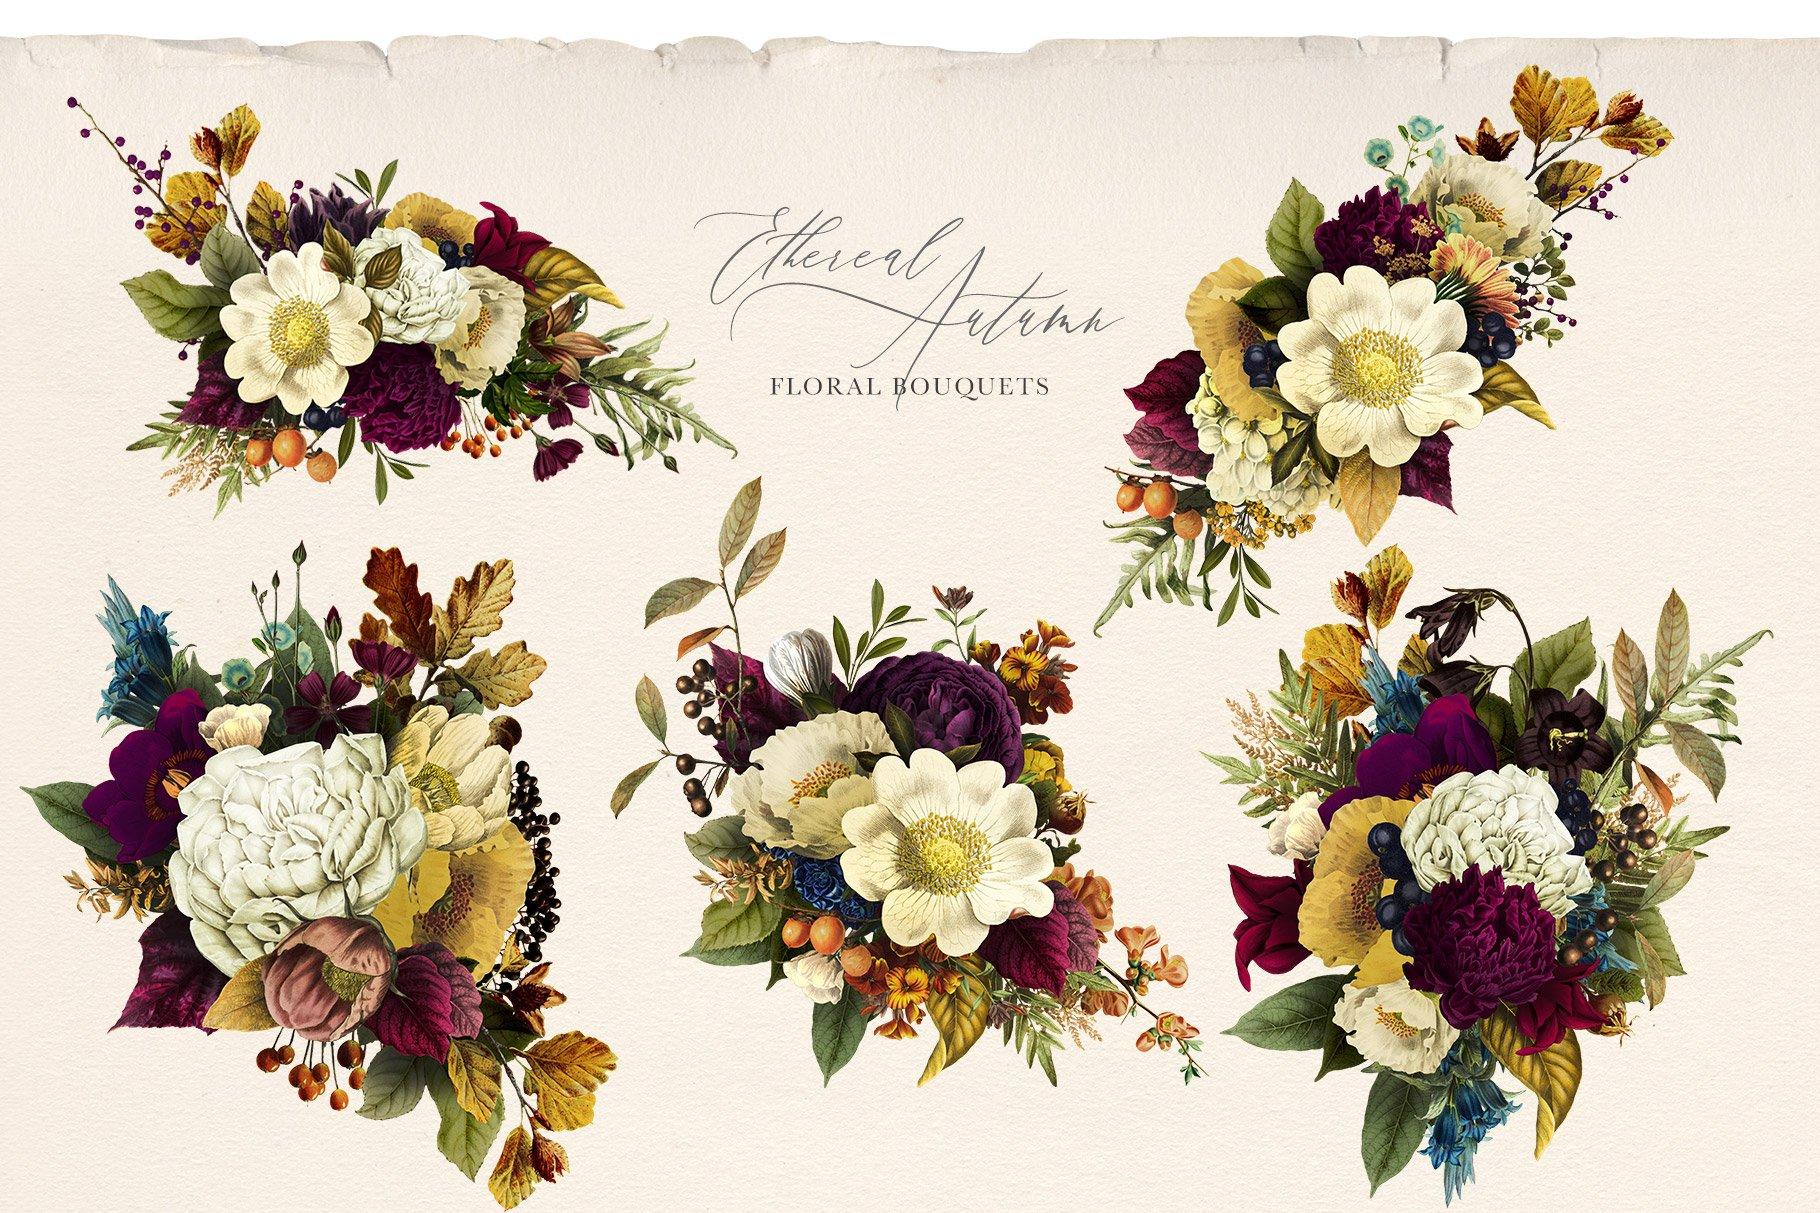 35款高清复古植物花卉平面广告背景设计PNG免抠图片素材 Ethereal Autumn Floral Bouquets插图(2)